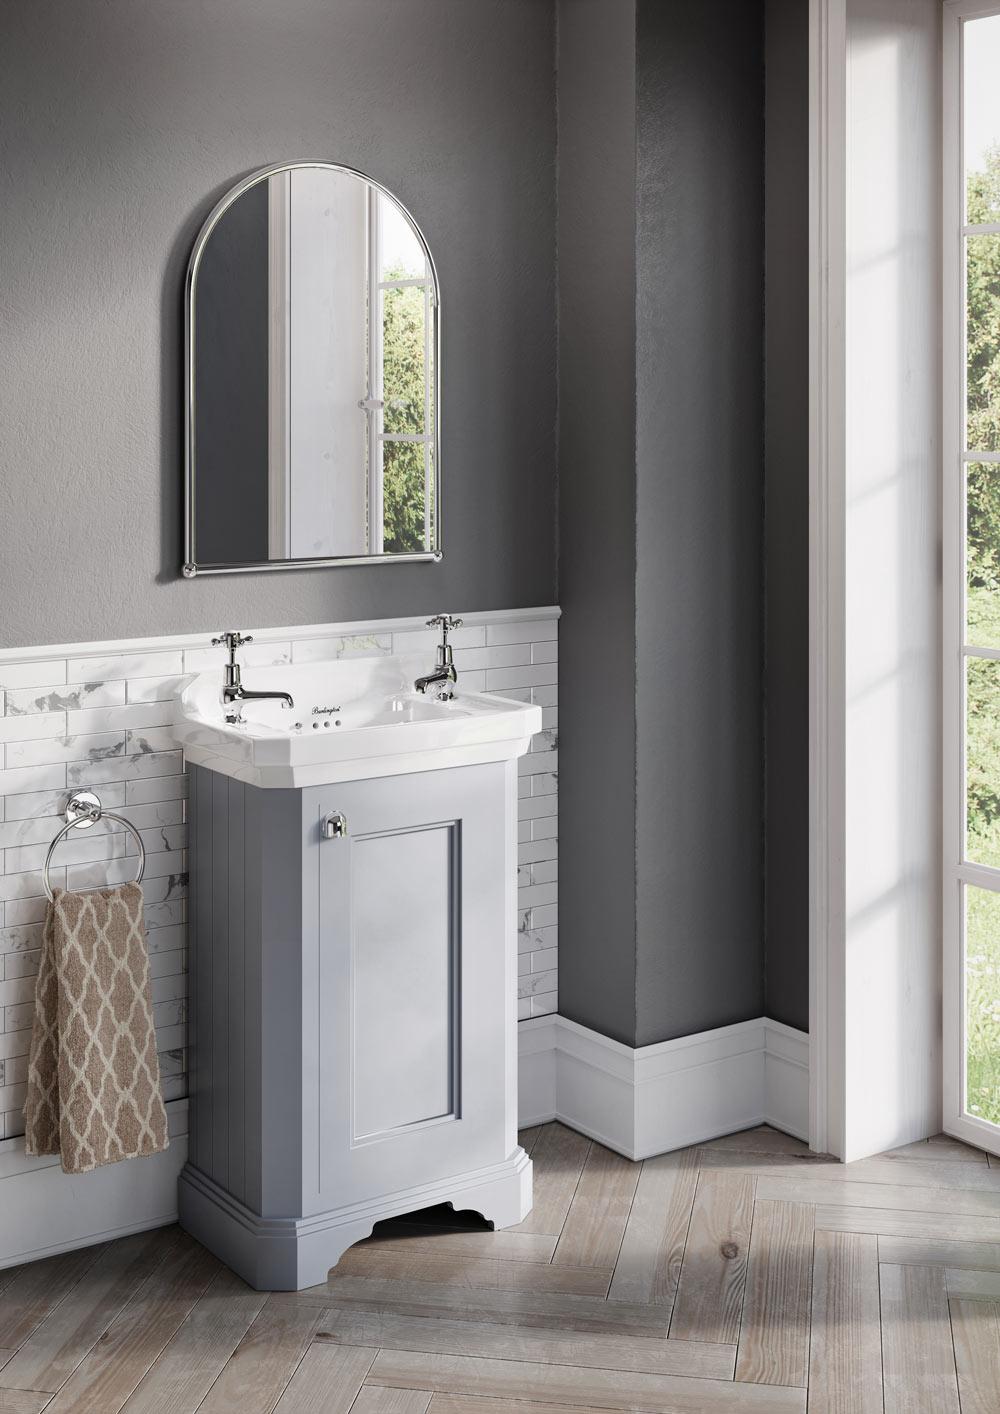 Freestanding Rectangular Cloakrom Vanity Unit Btw